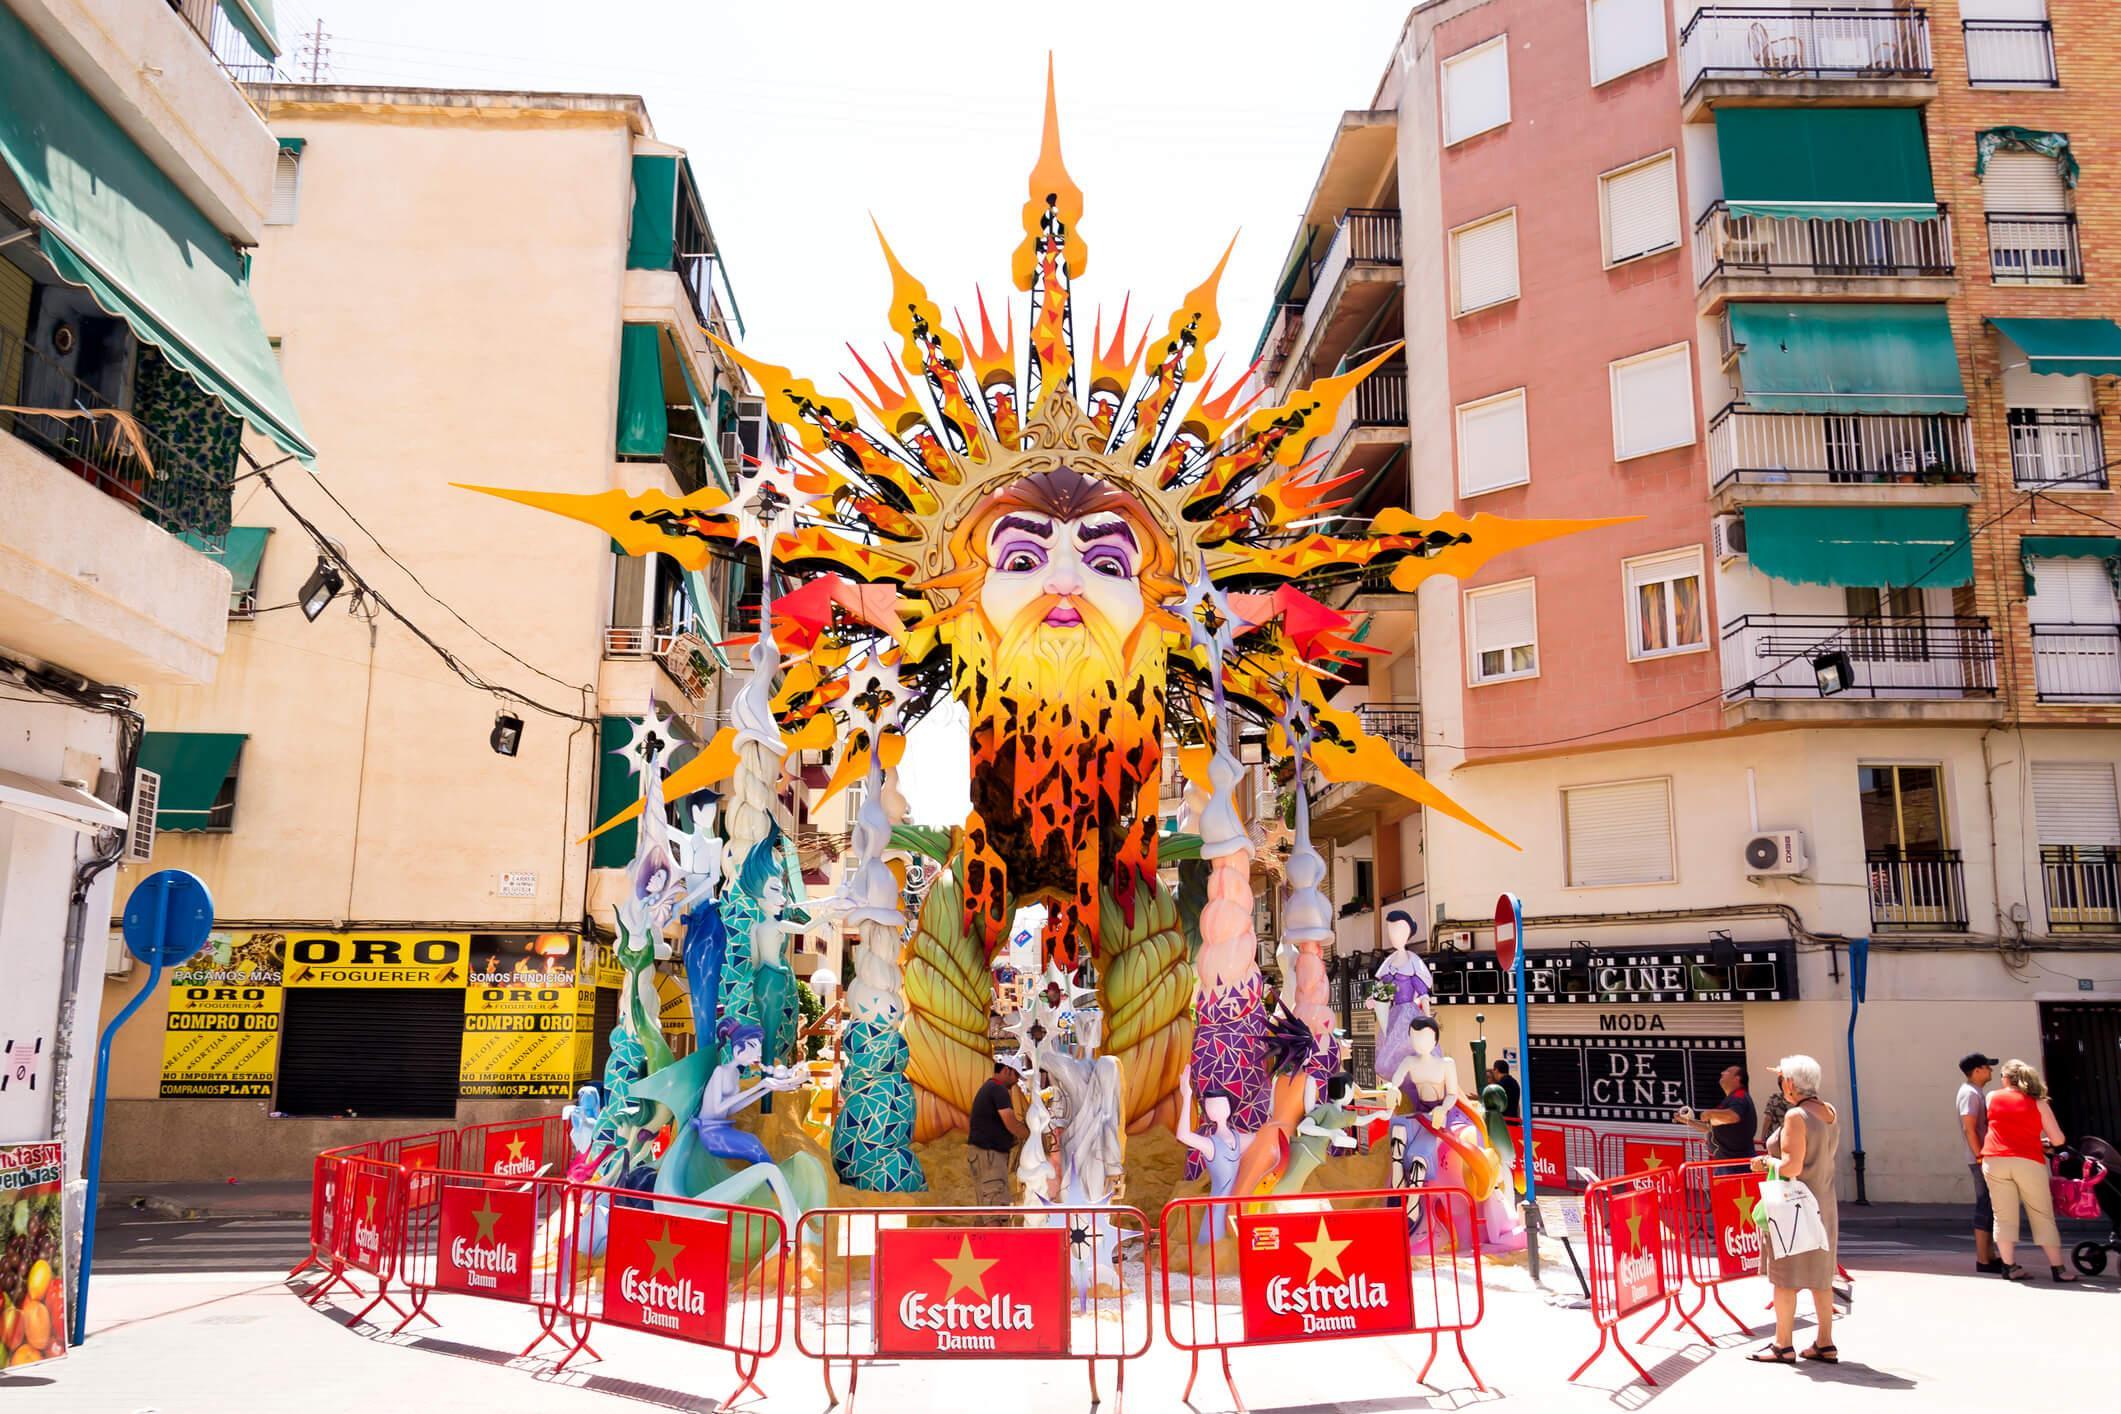 Hoteles Fiesta de San Juan Portada